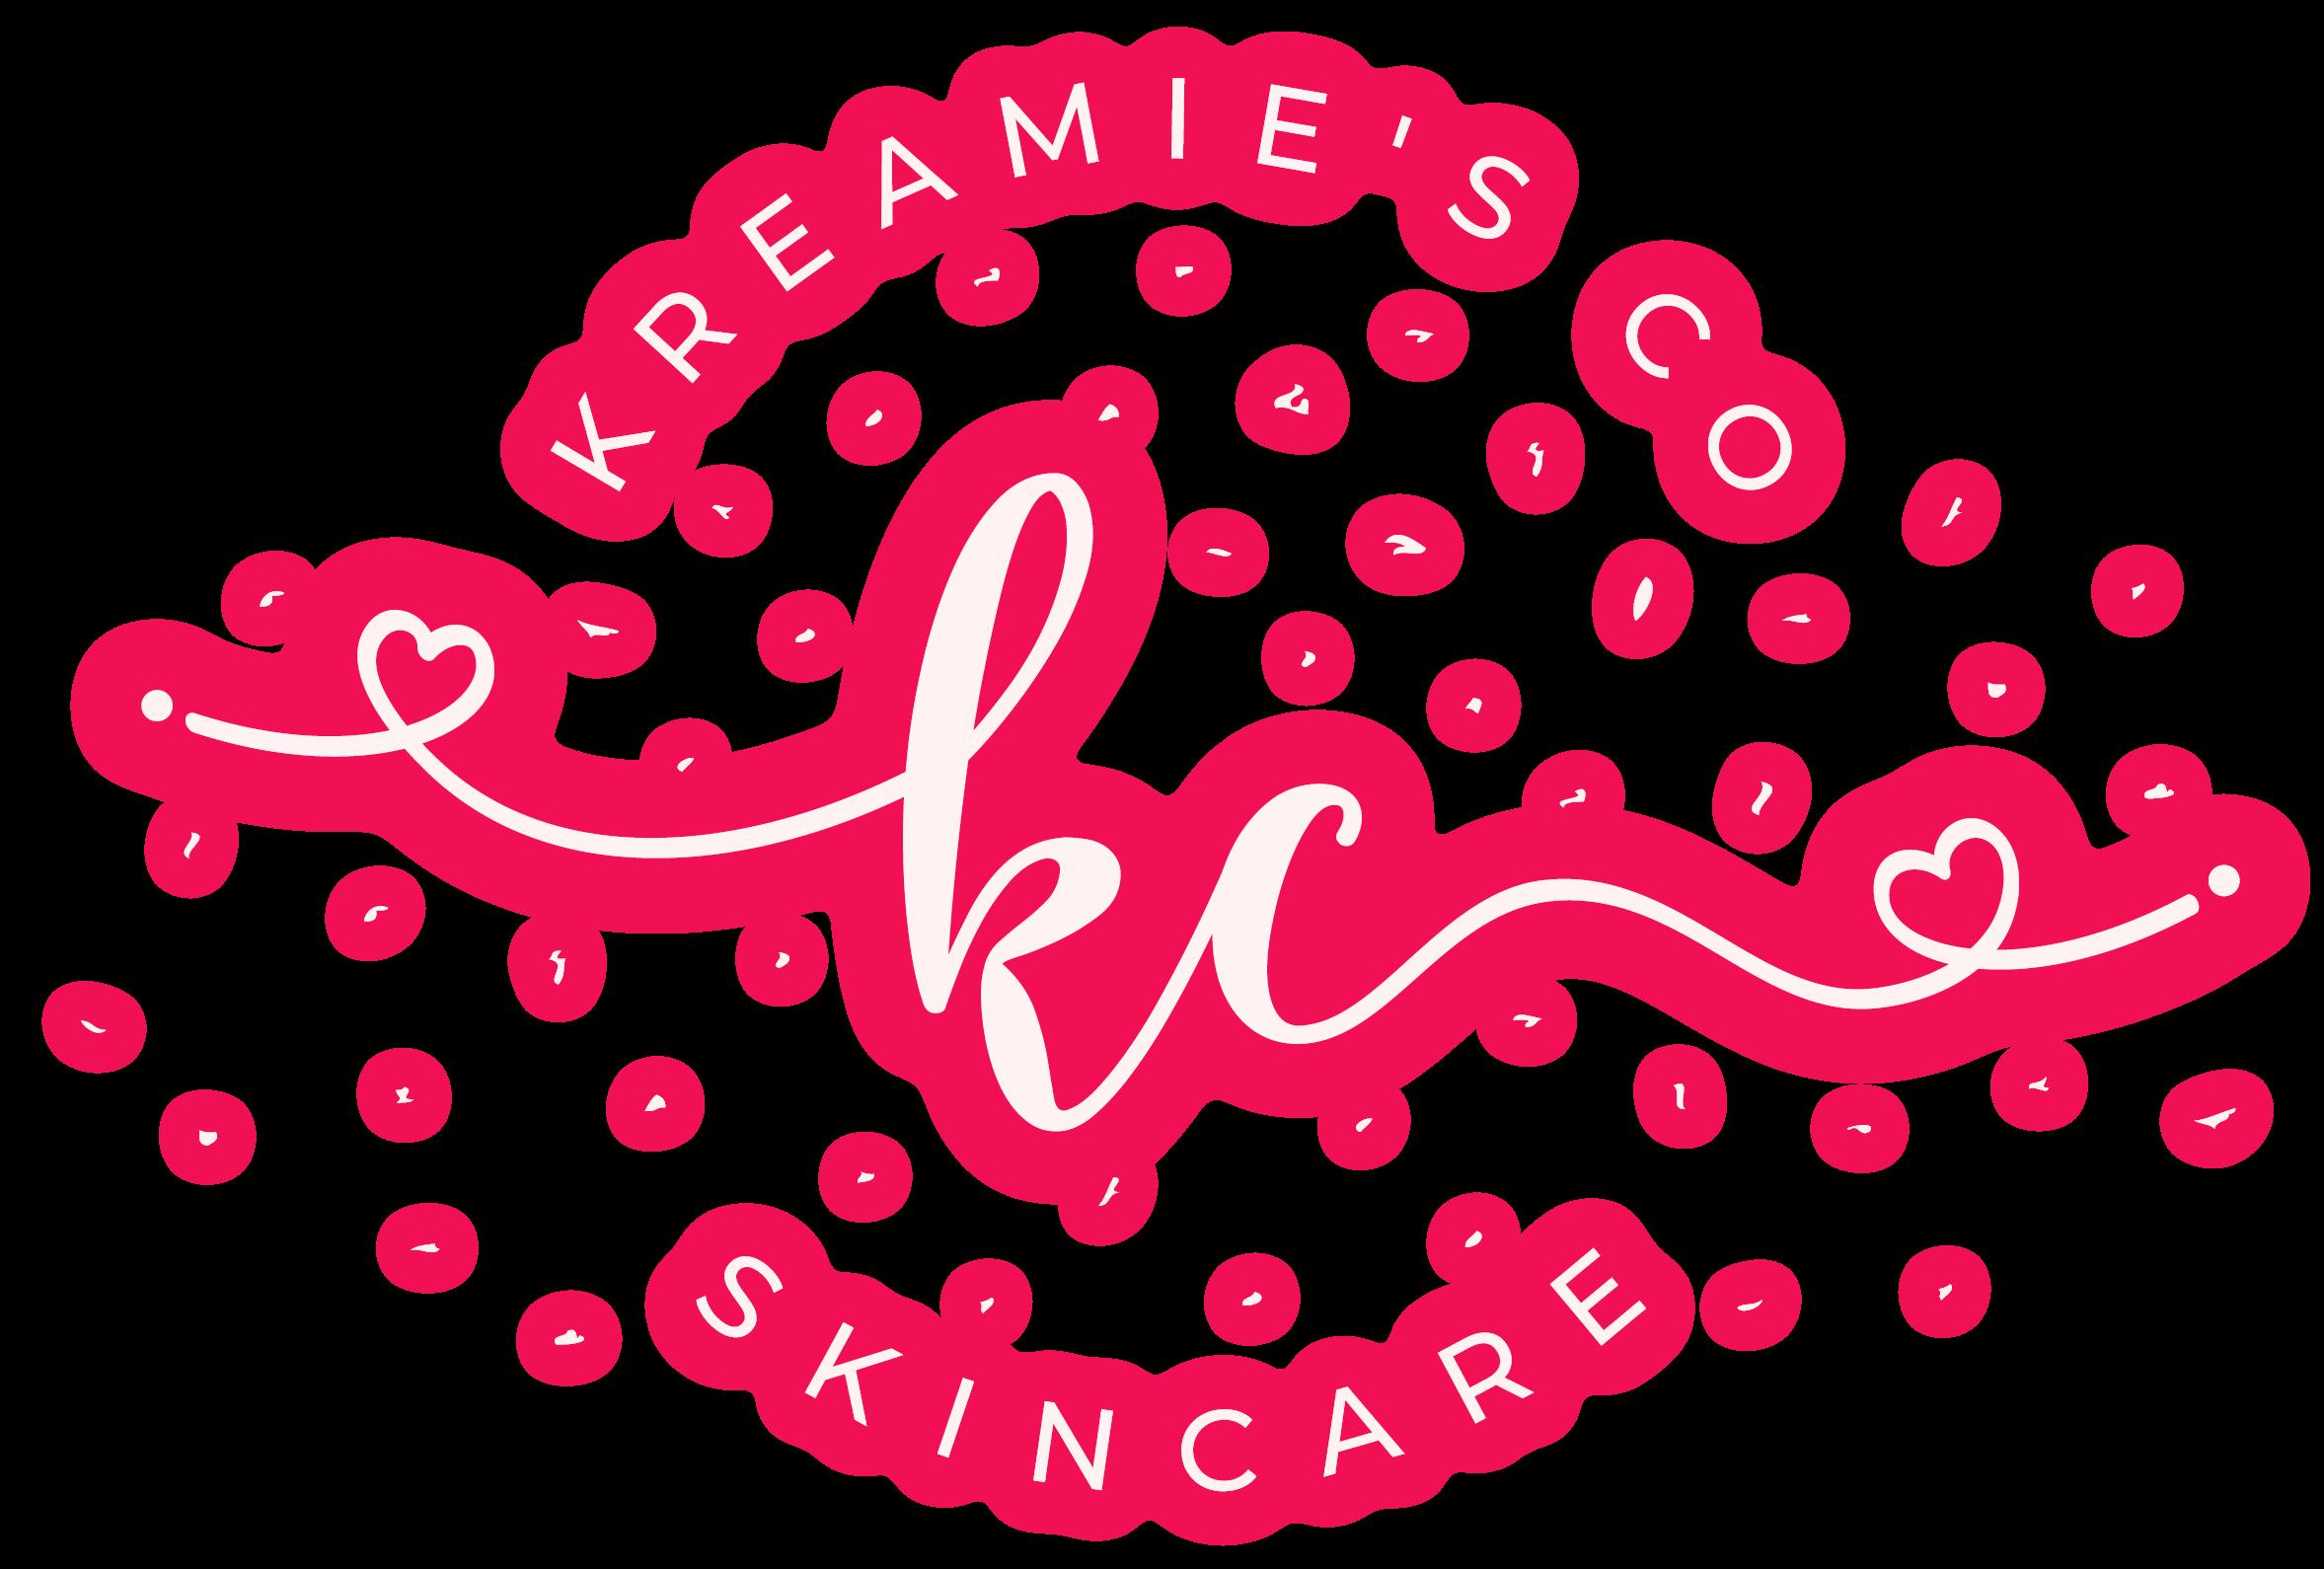 Kreamie's Co